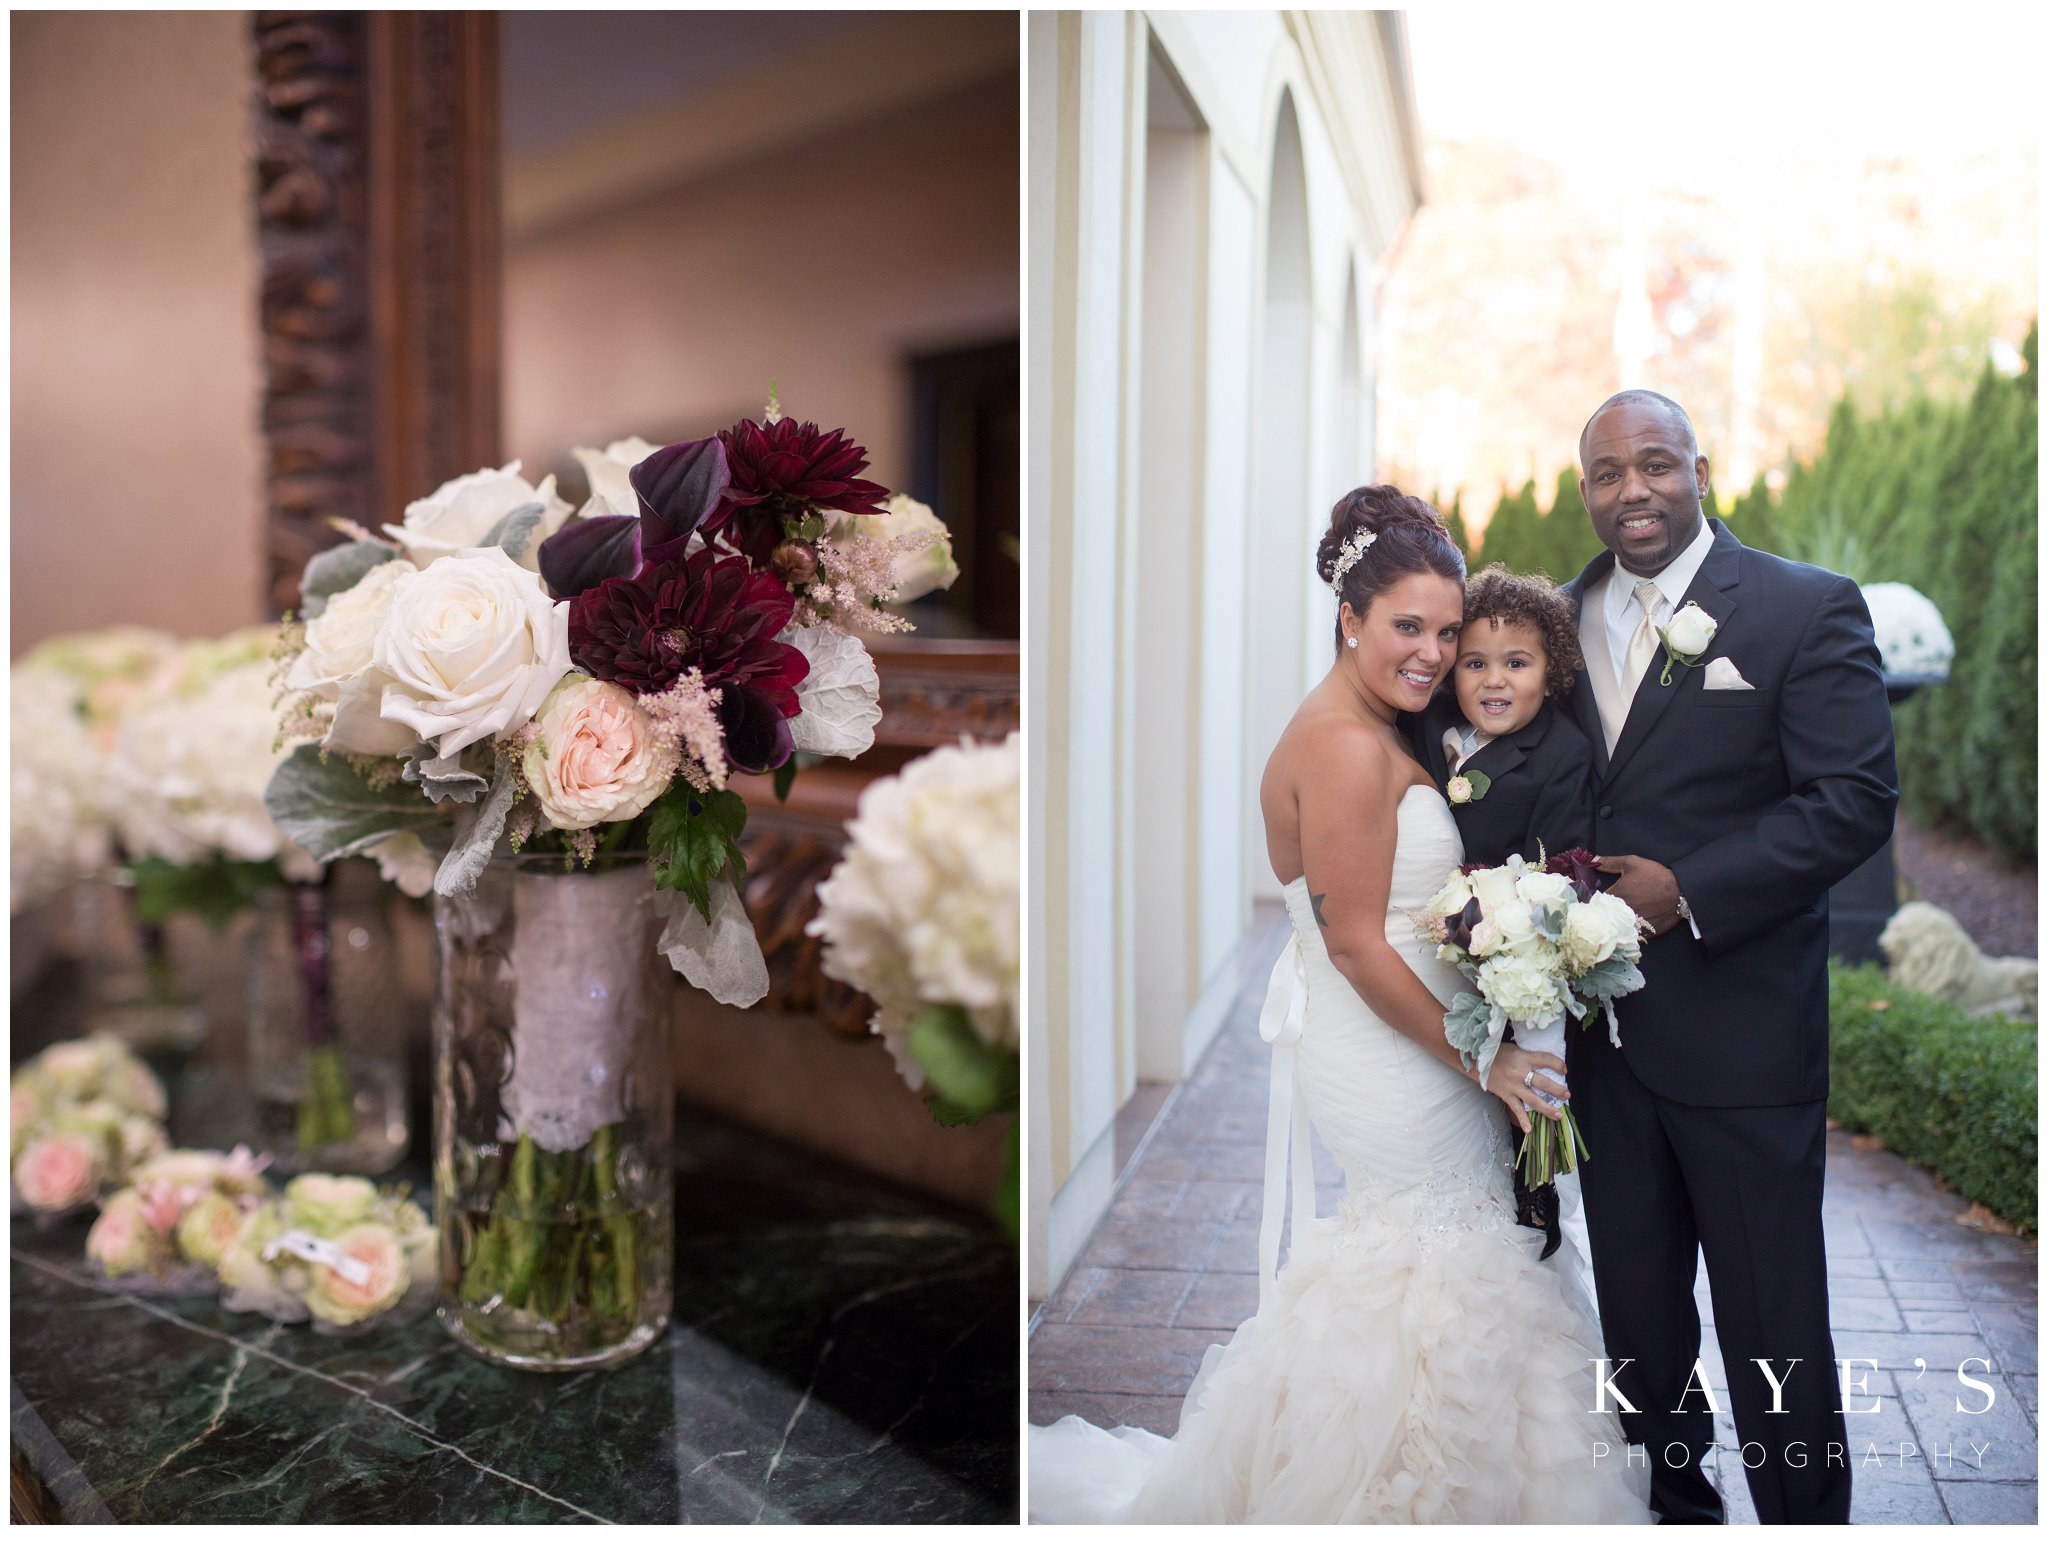 Kayes Photography- howell-michigan-wedding-photographer_0652.jpg